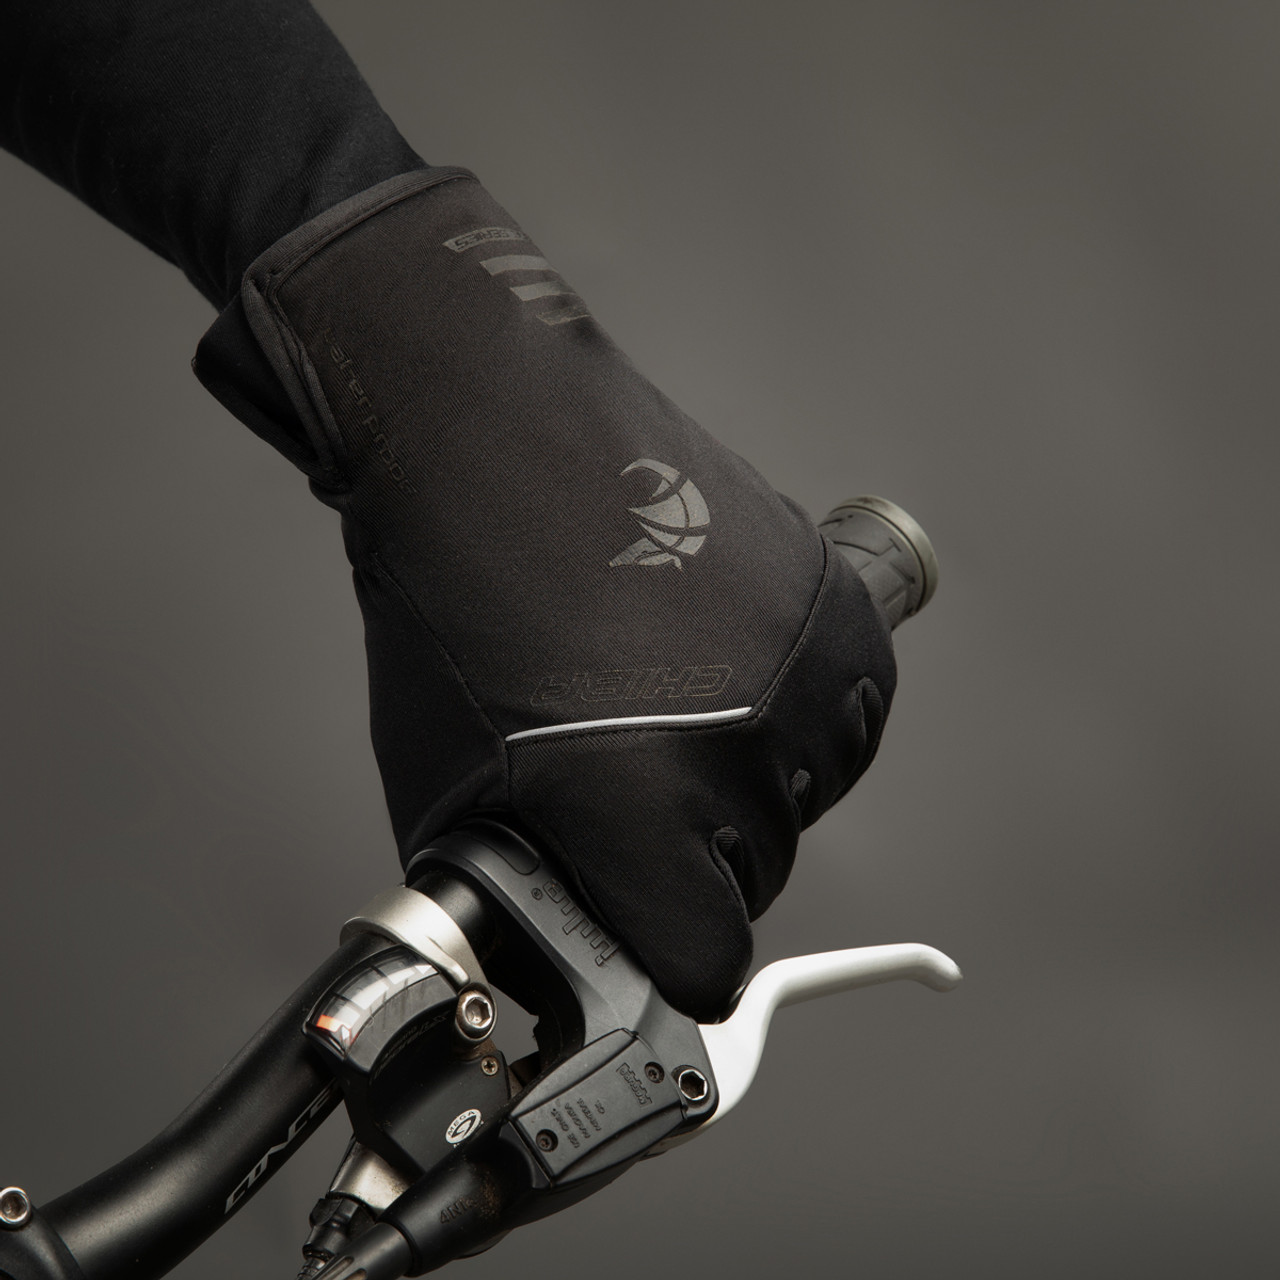 Chiba 2nd Skin Waterproof / Windprotect Winter Gloves